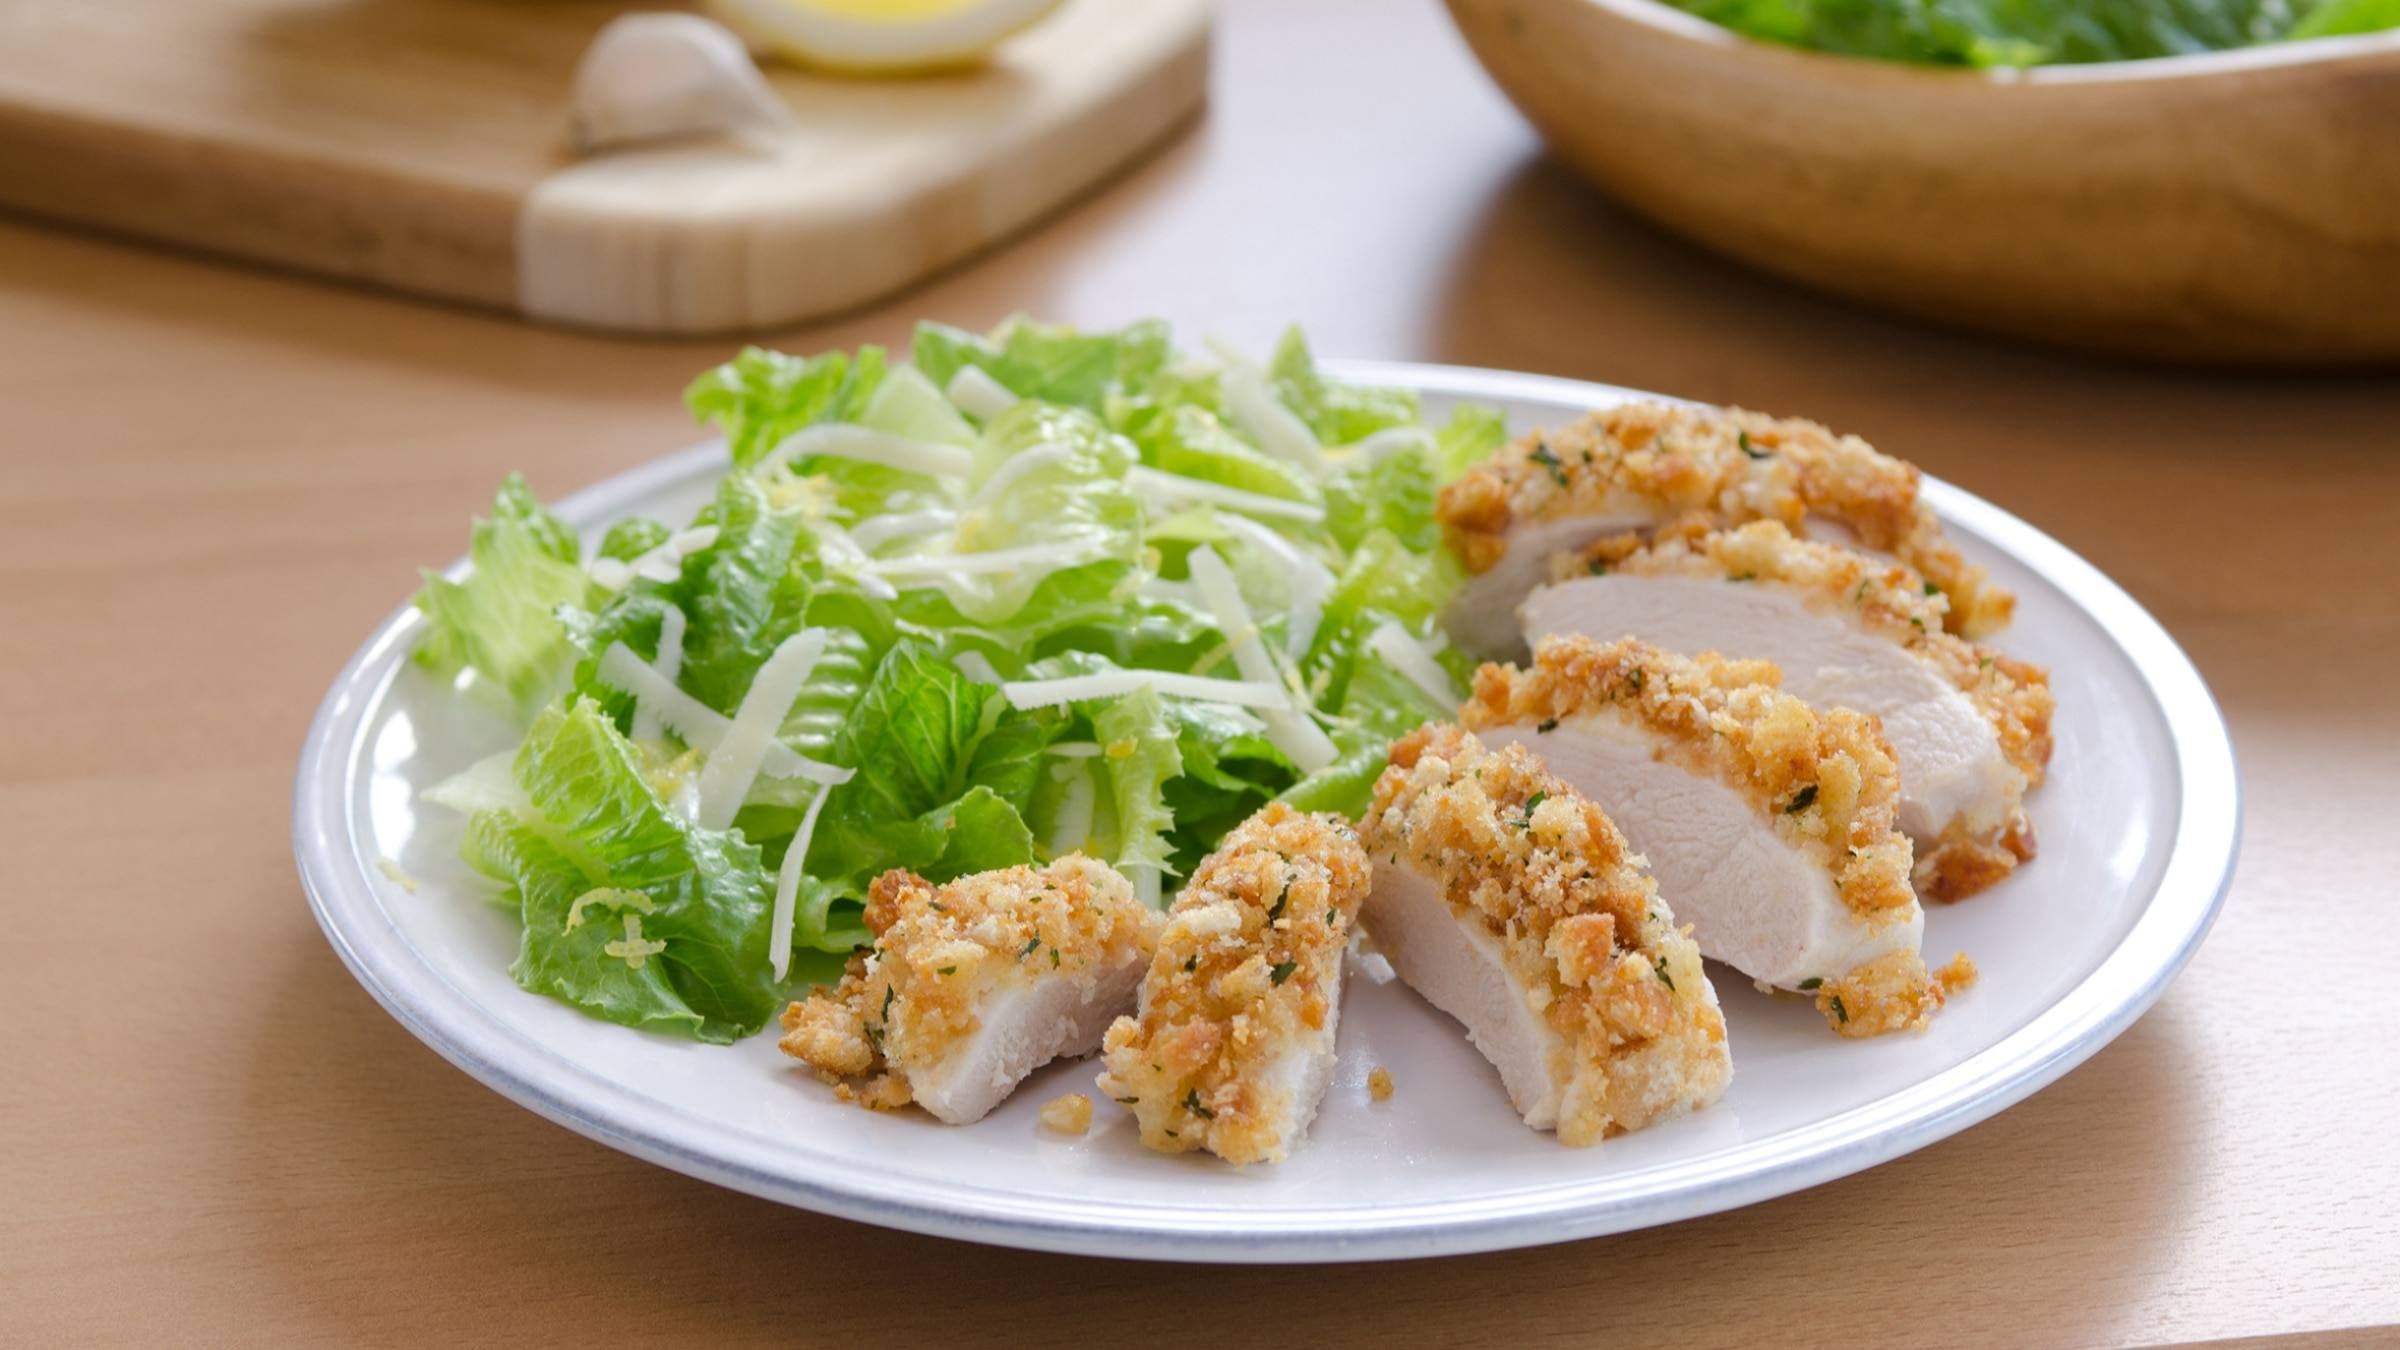 Caesar-Crusted Chicken Recipe